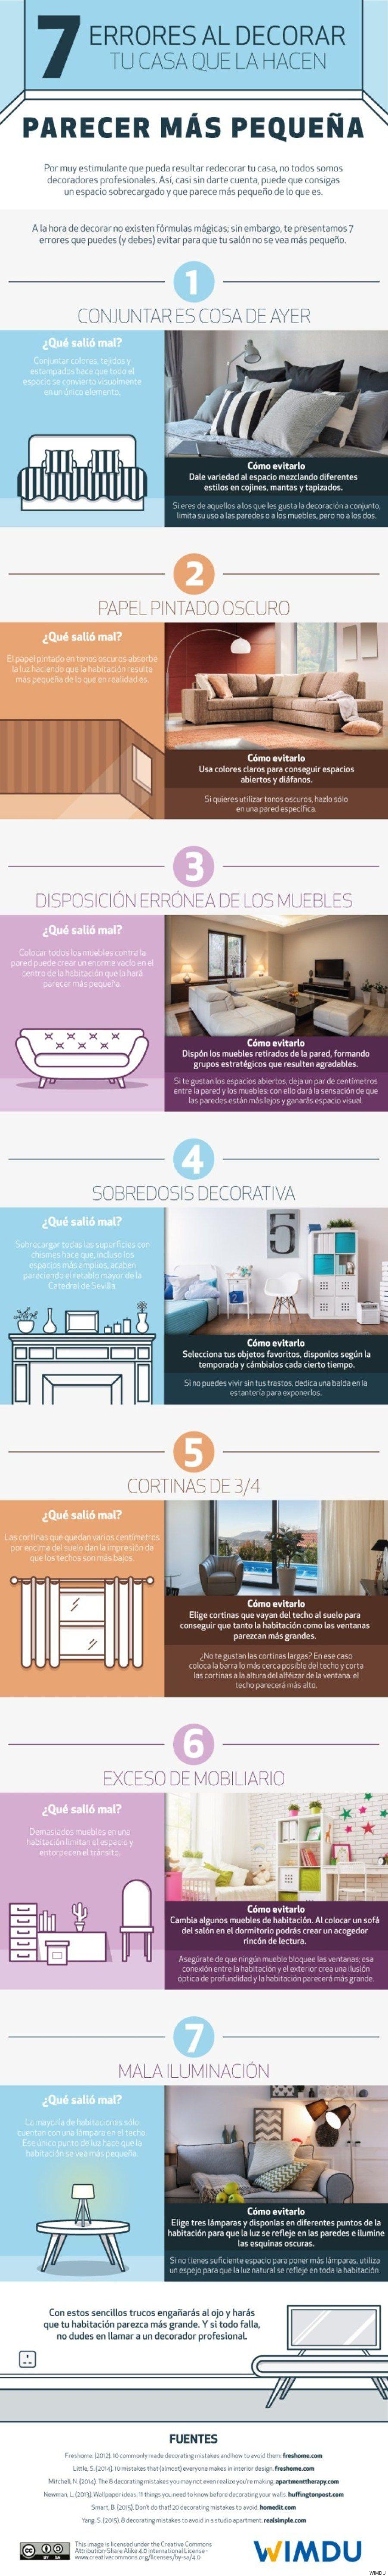 7 trucos de decoraci n para evitar que tu casa parezca m s peque a decoraci n y hogar - Trucos para casas pequenas ...